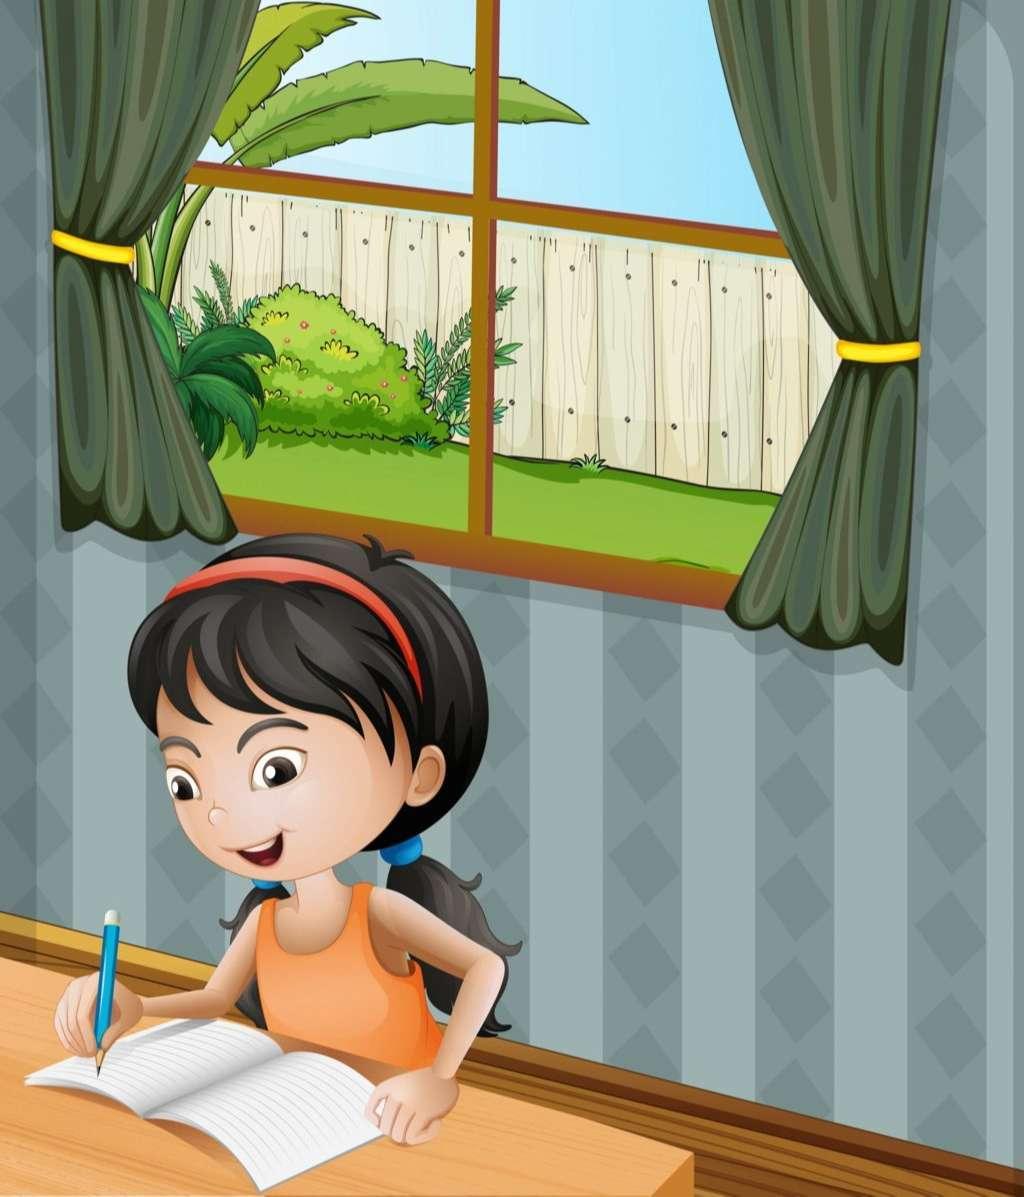 A girl with a headband writing